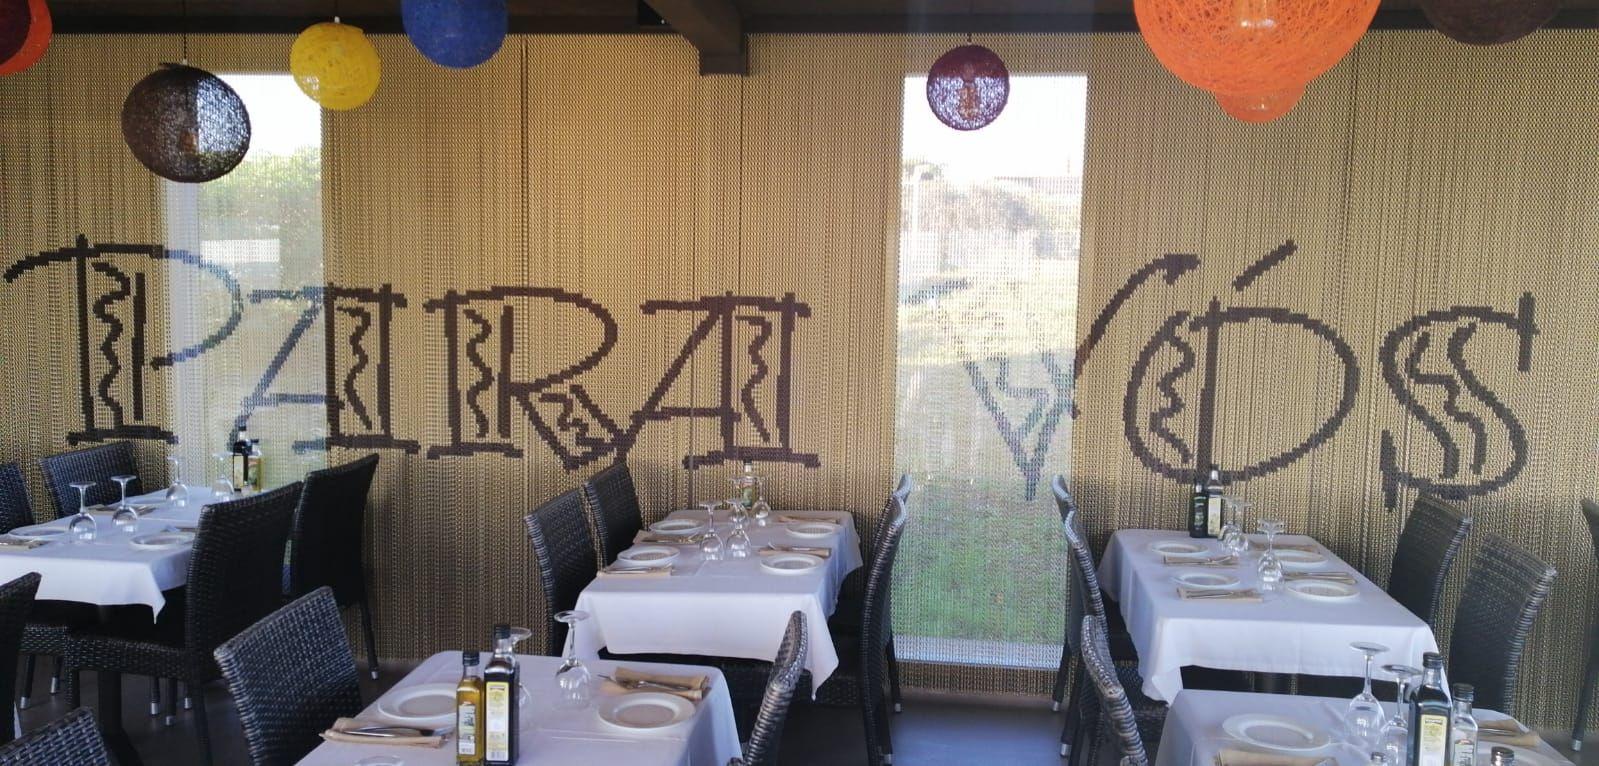 Restaurante argentino en Barcelona